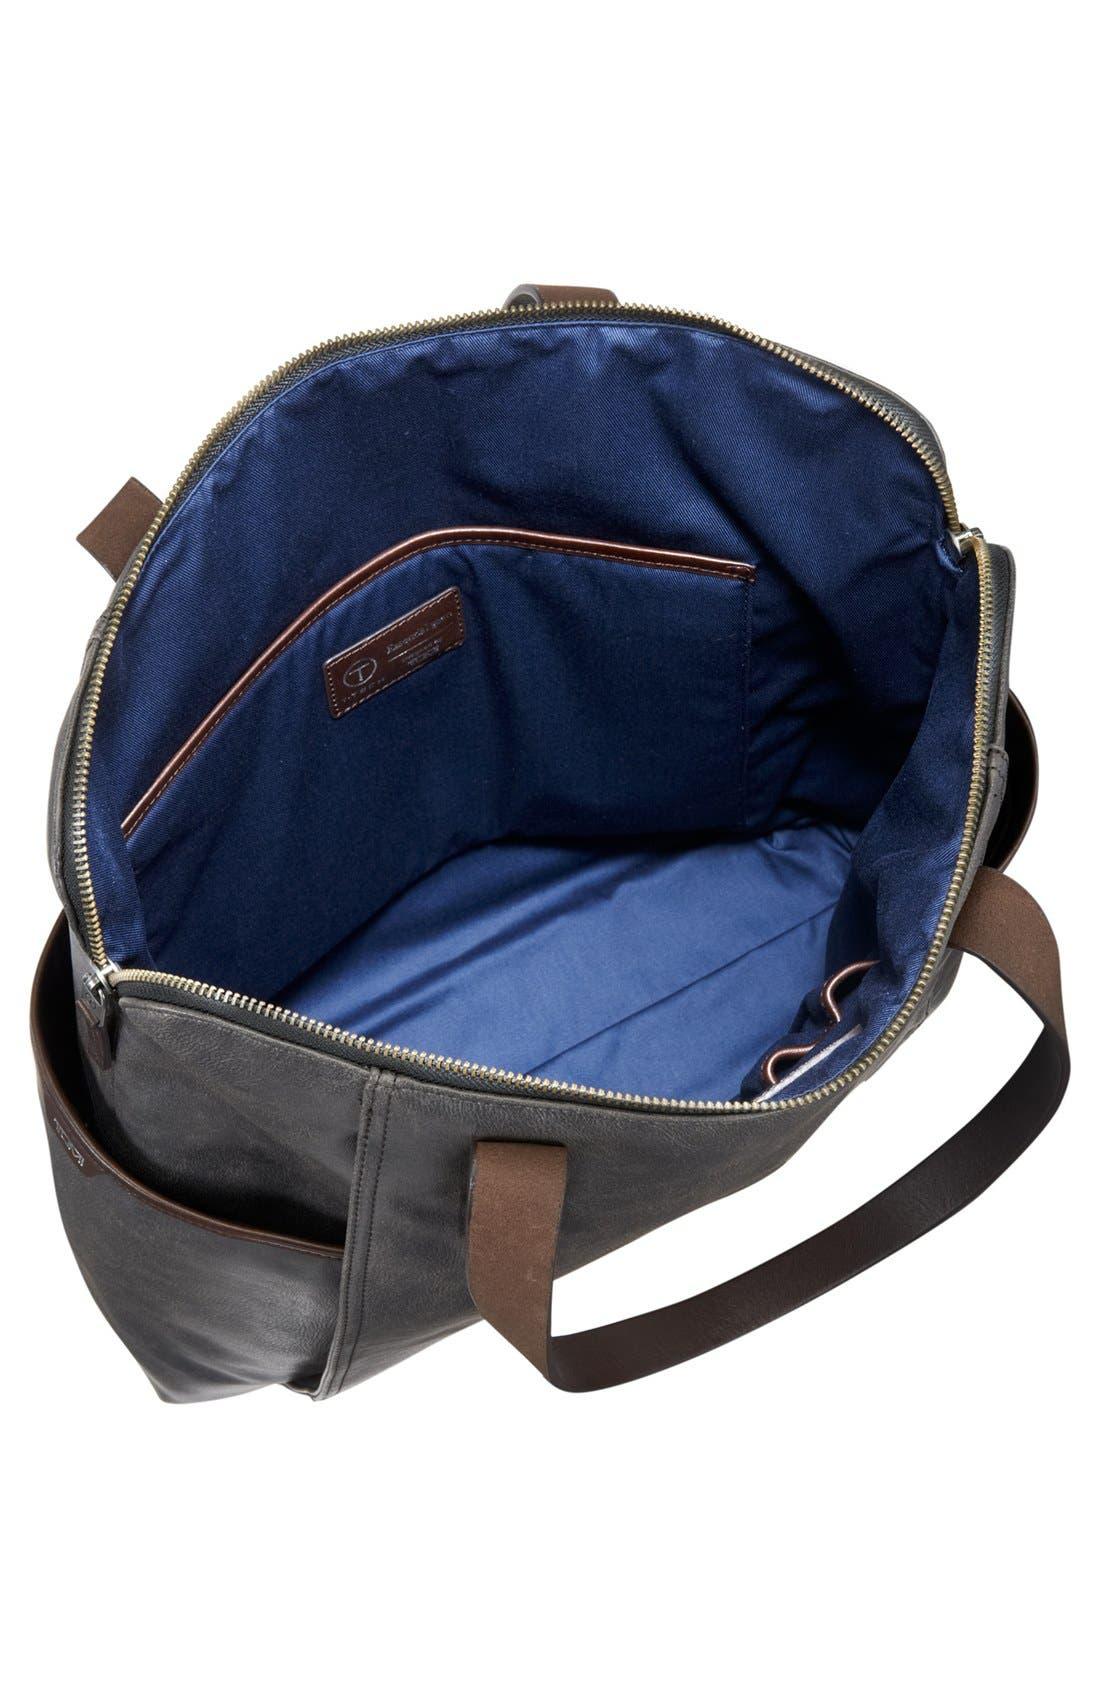 Alternate Image 3  - T-Tech by Tumi 'Forge - Sudbury' Tote Bag